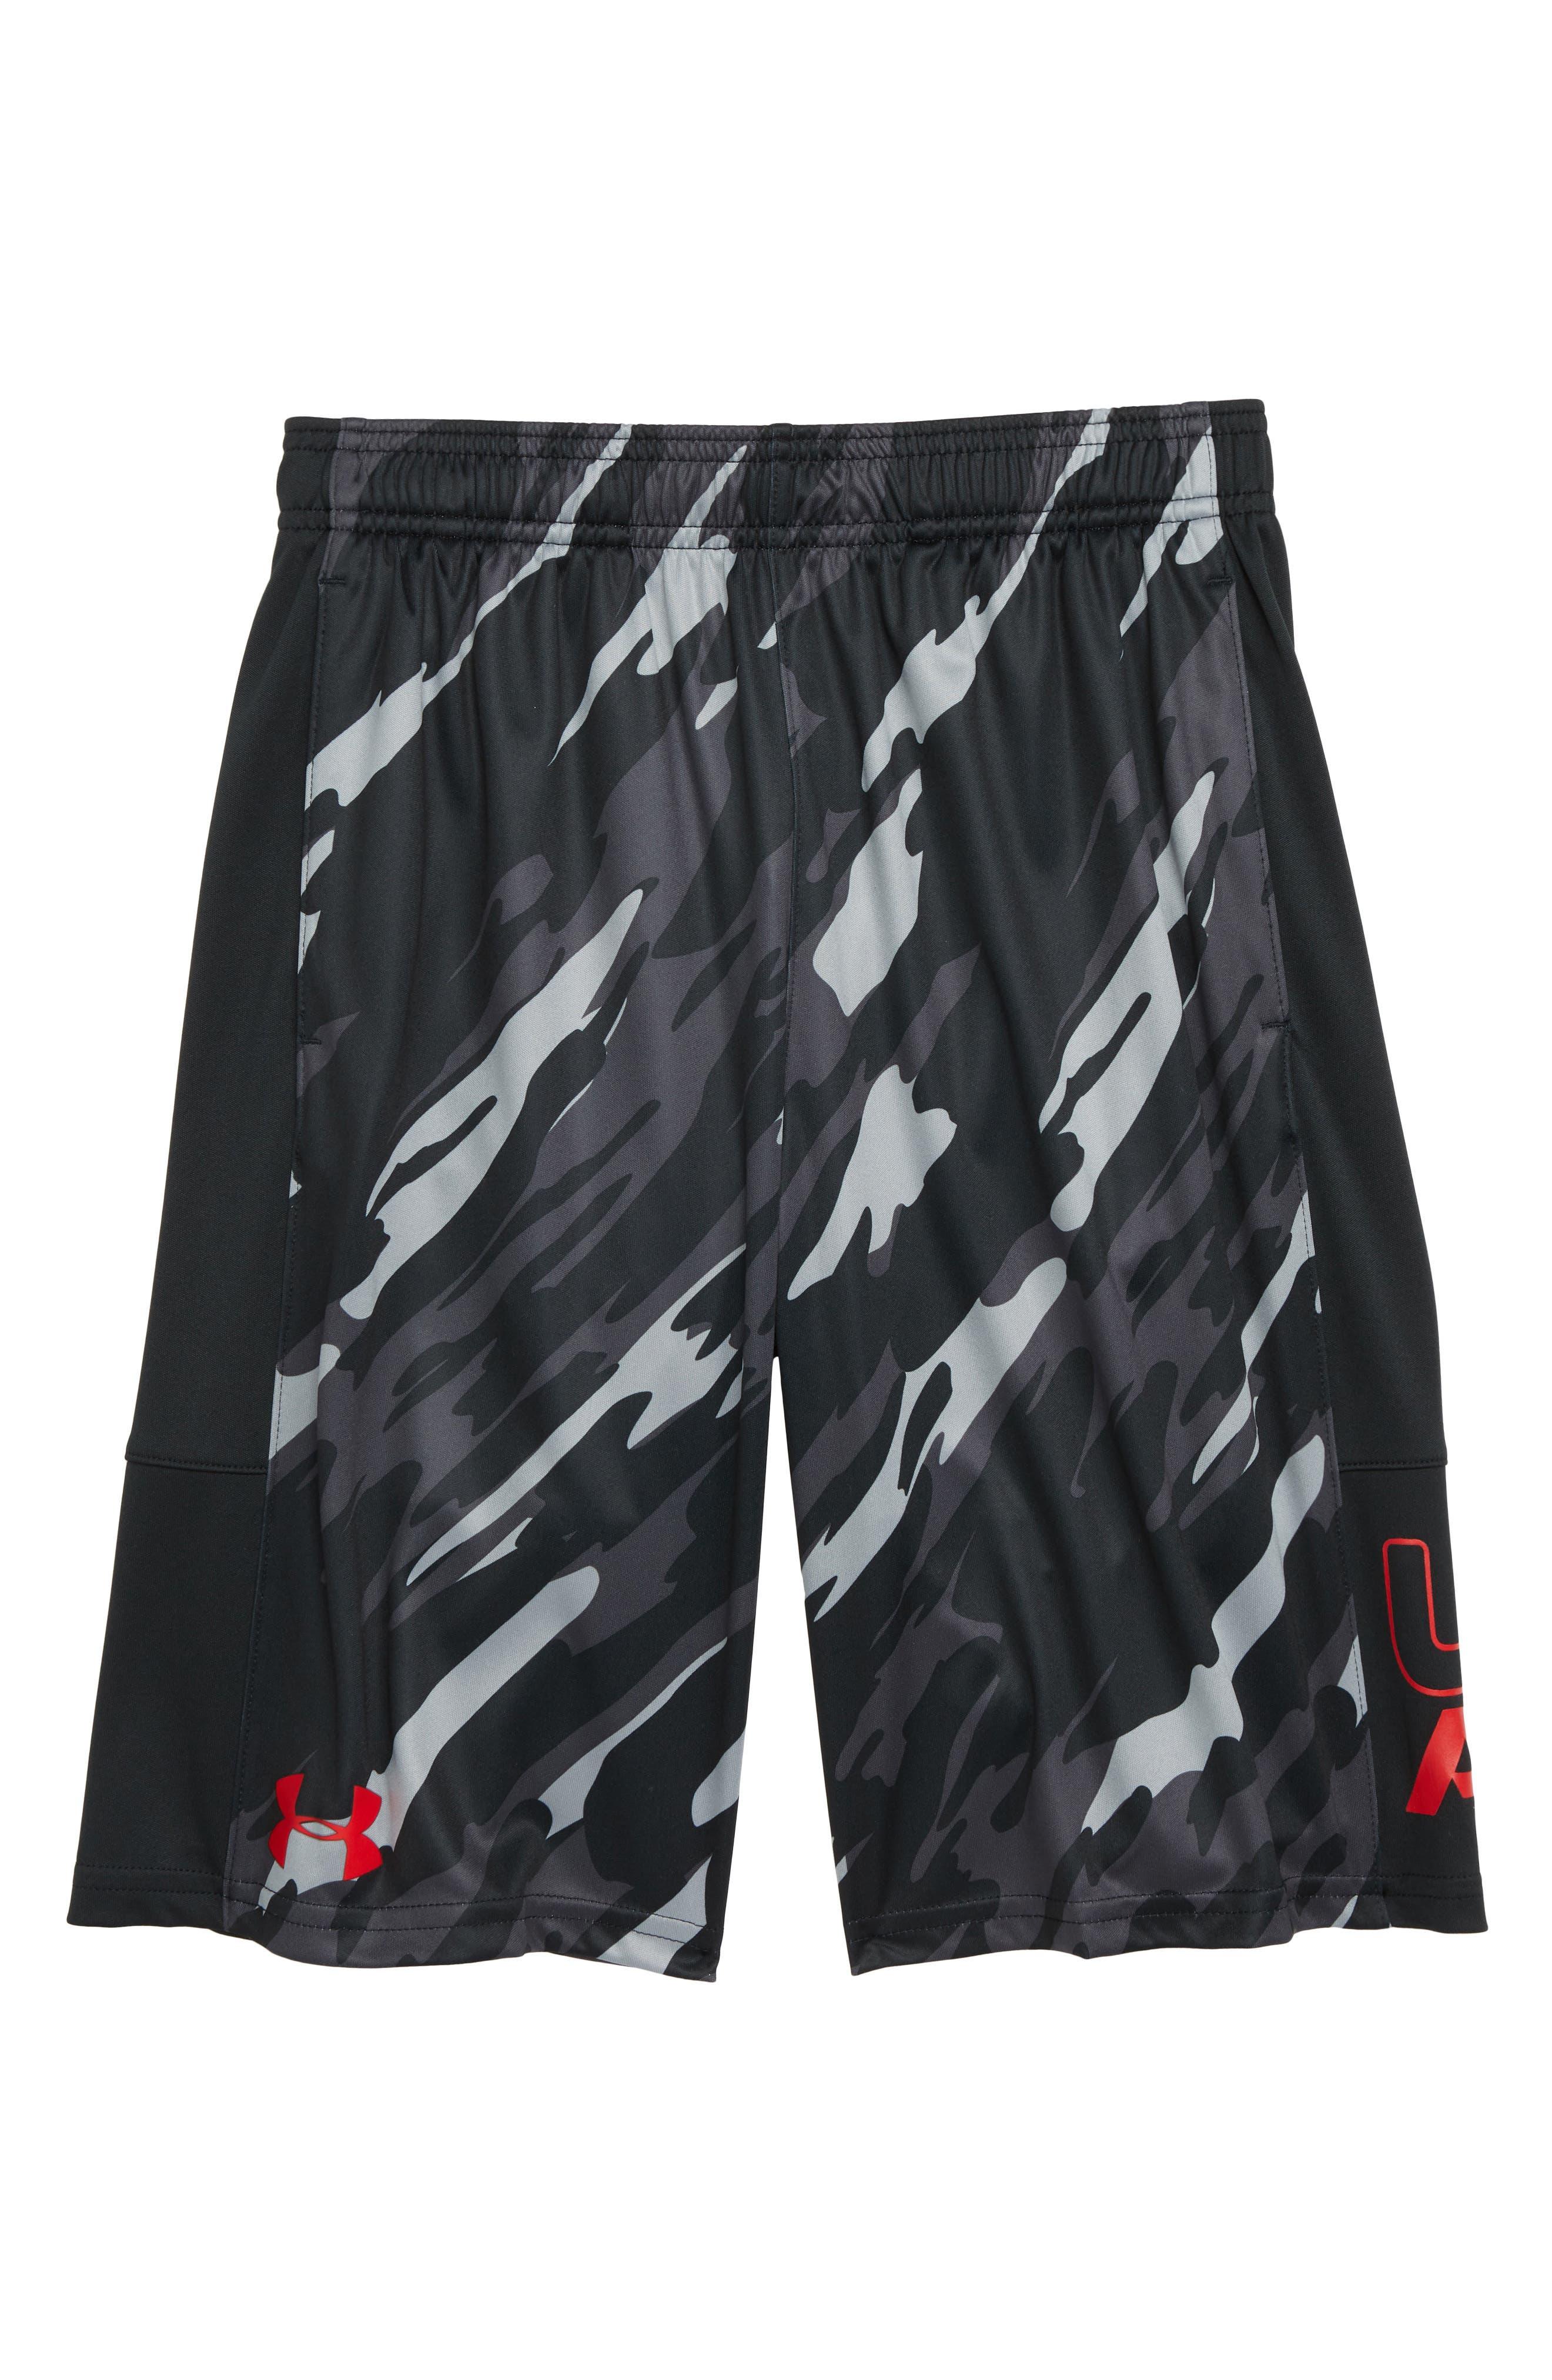 Stunt HeatGear<sup>®</sup> Shorts,                         Main,                         color, BLACK/RED